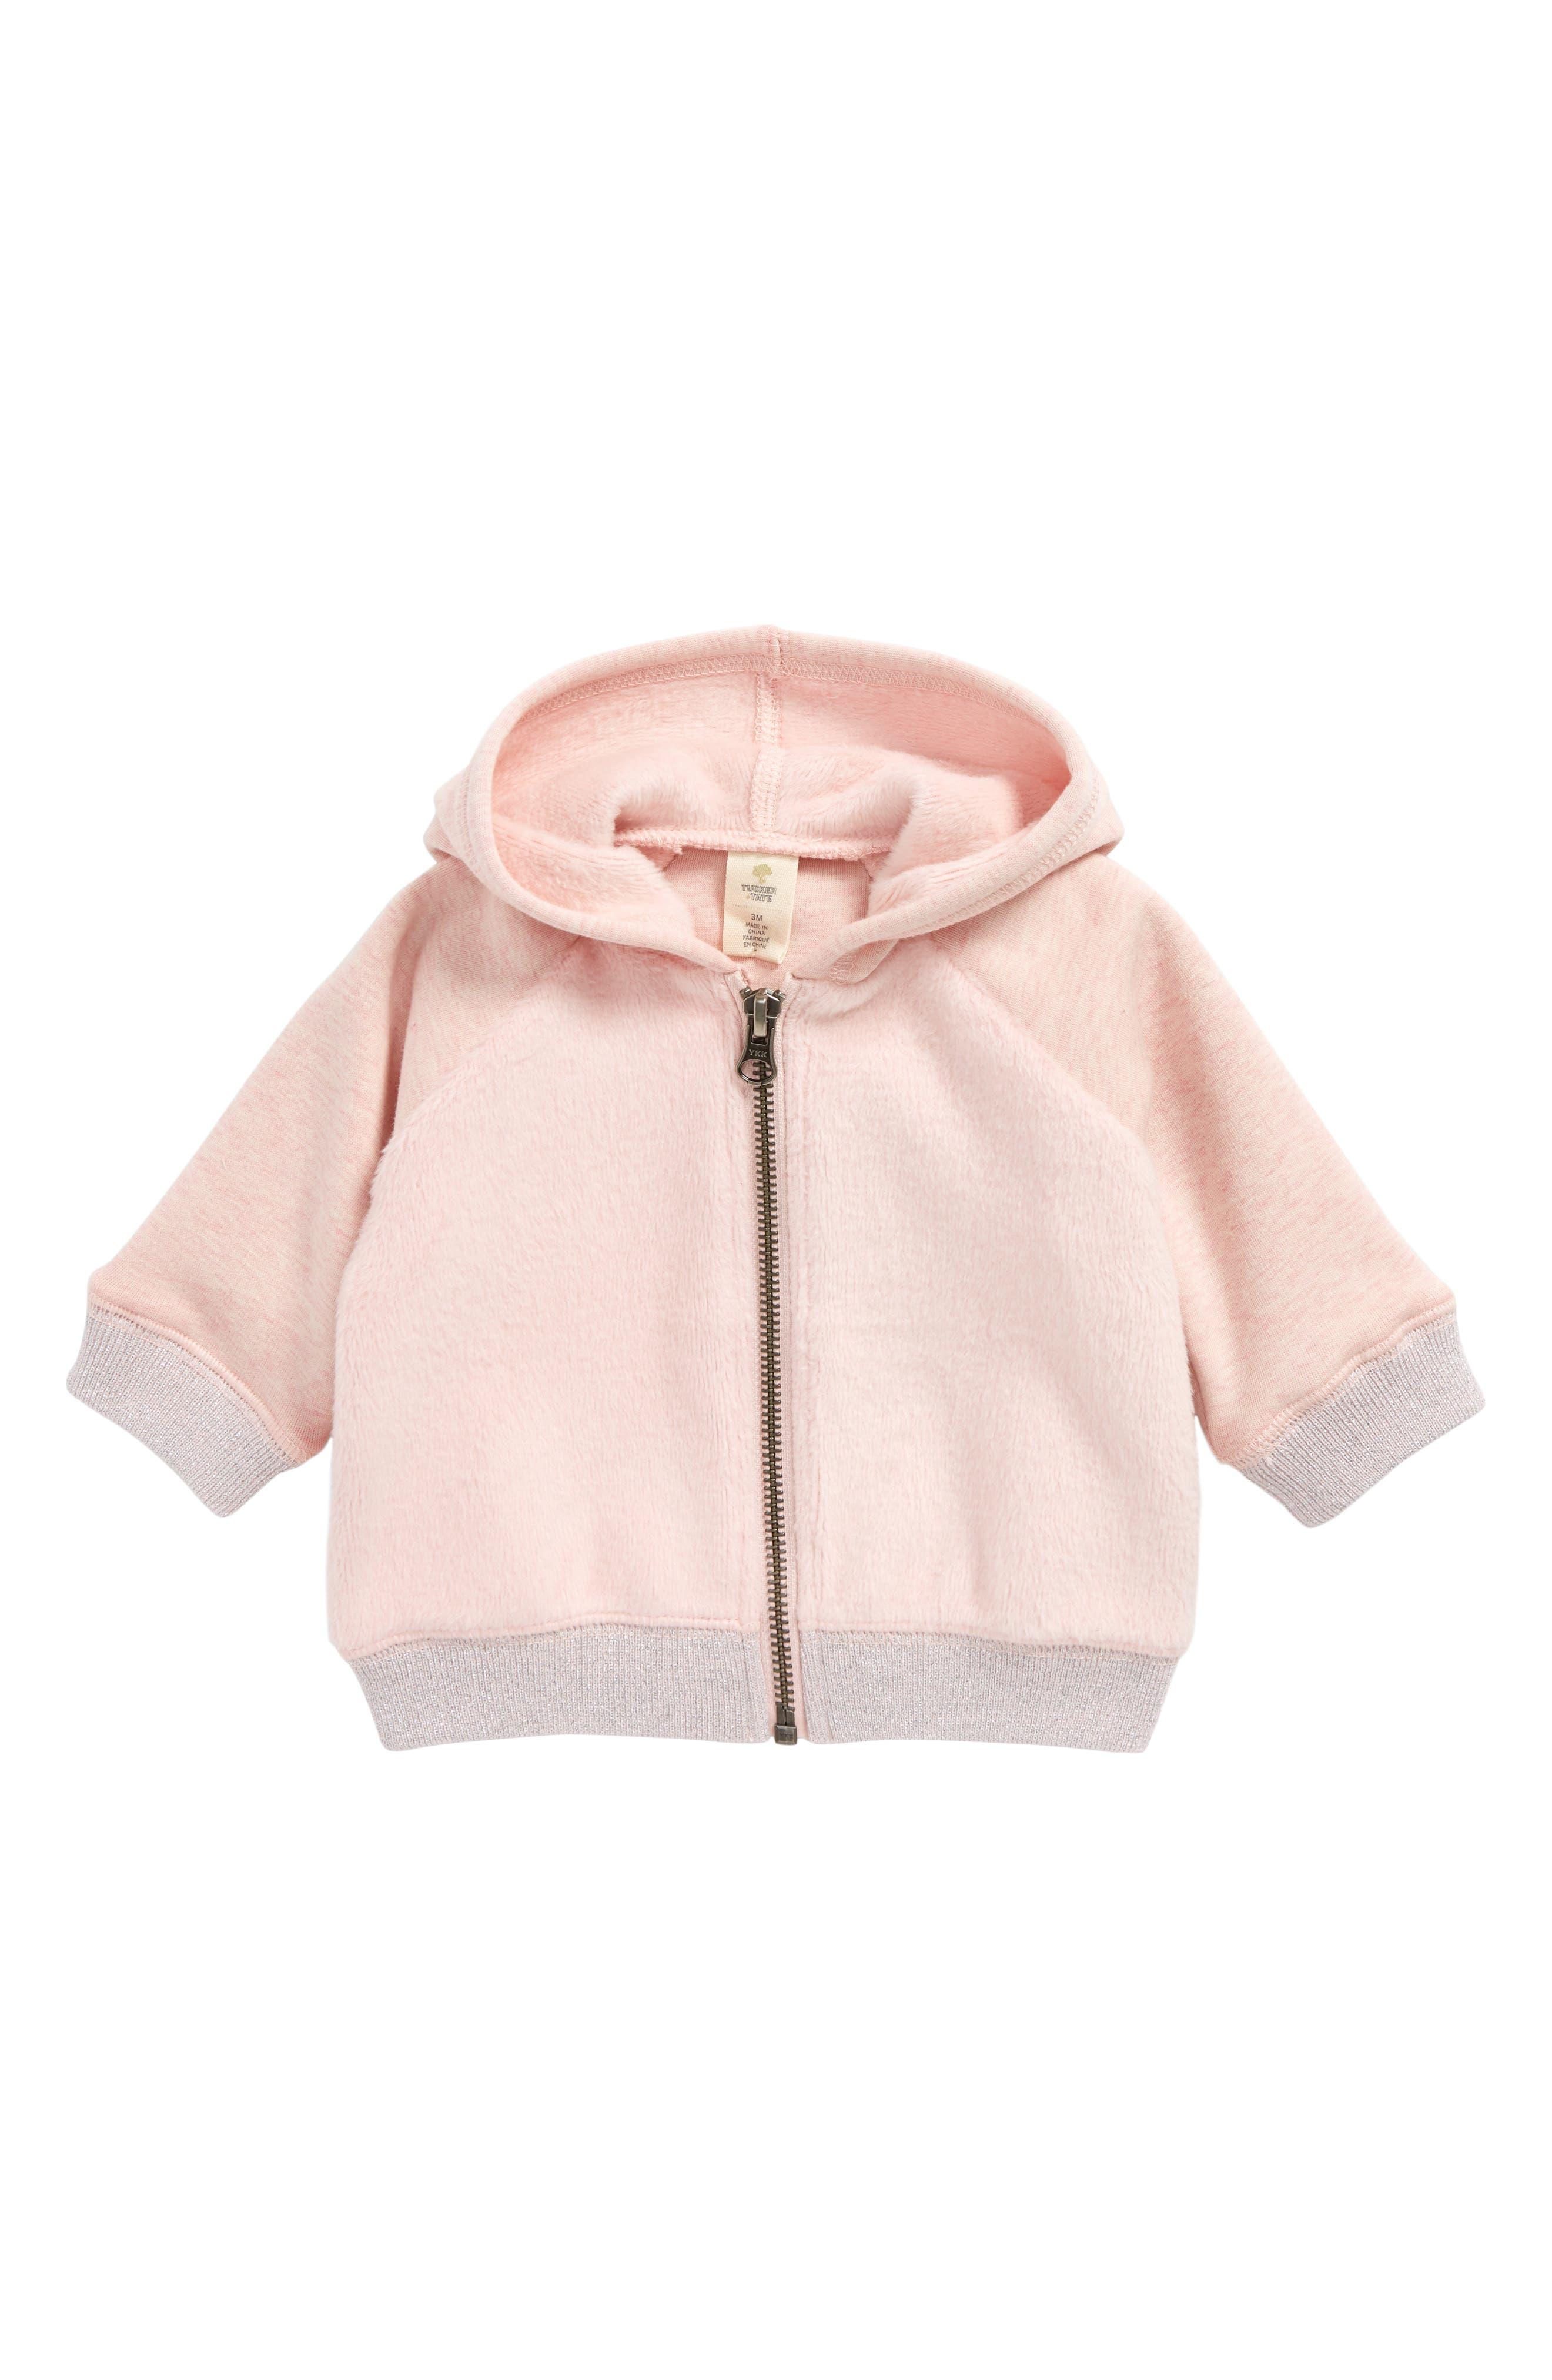 Cozy Zip-Up Hoodie,                         Main,                         color, Pink Silver